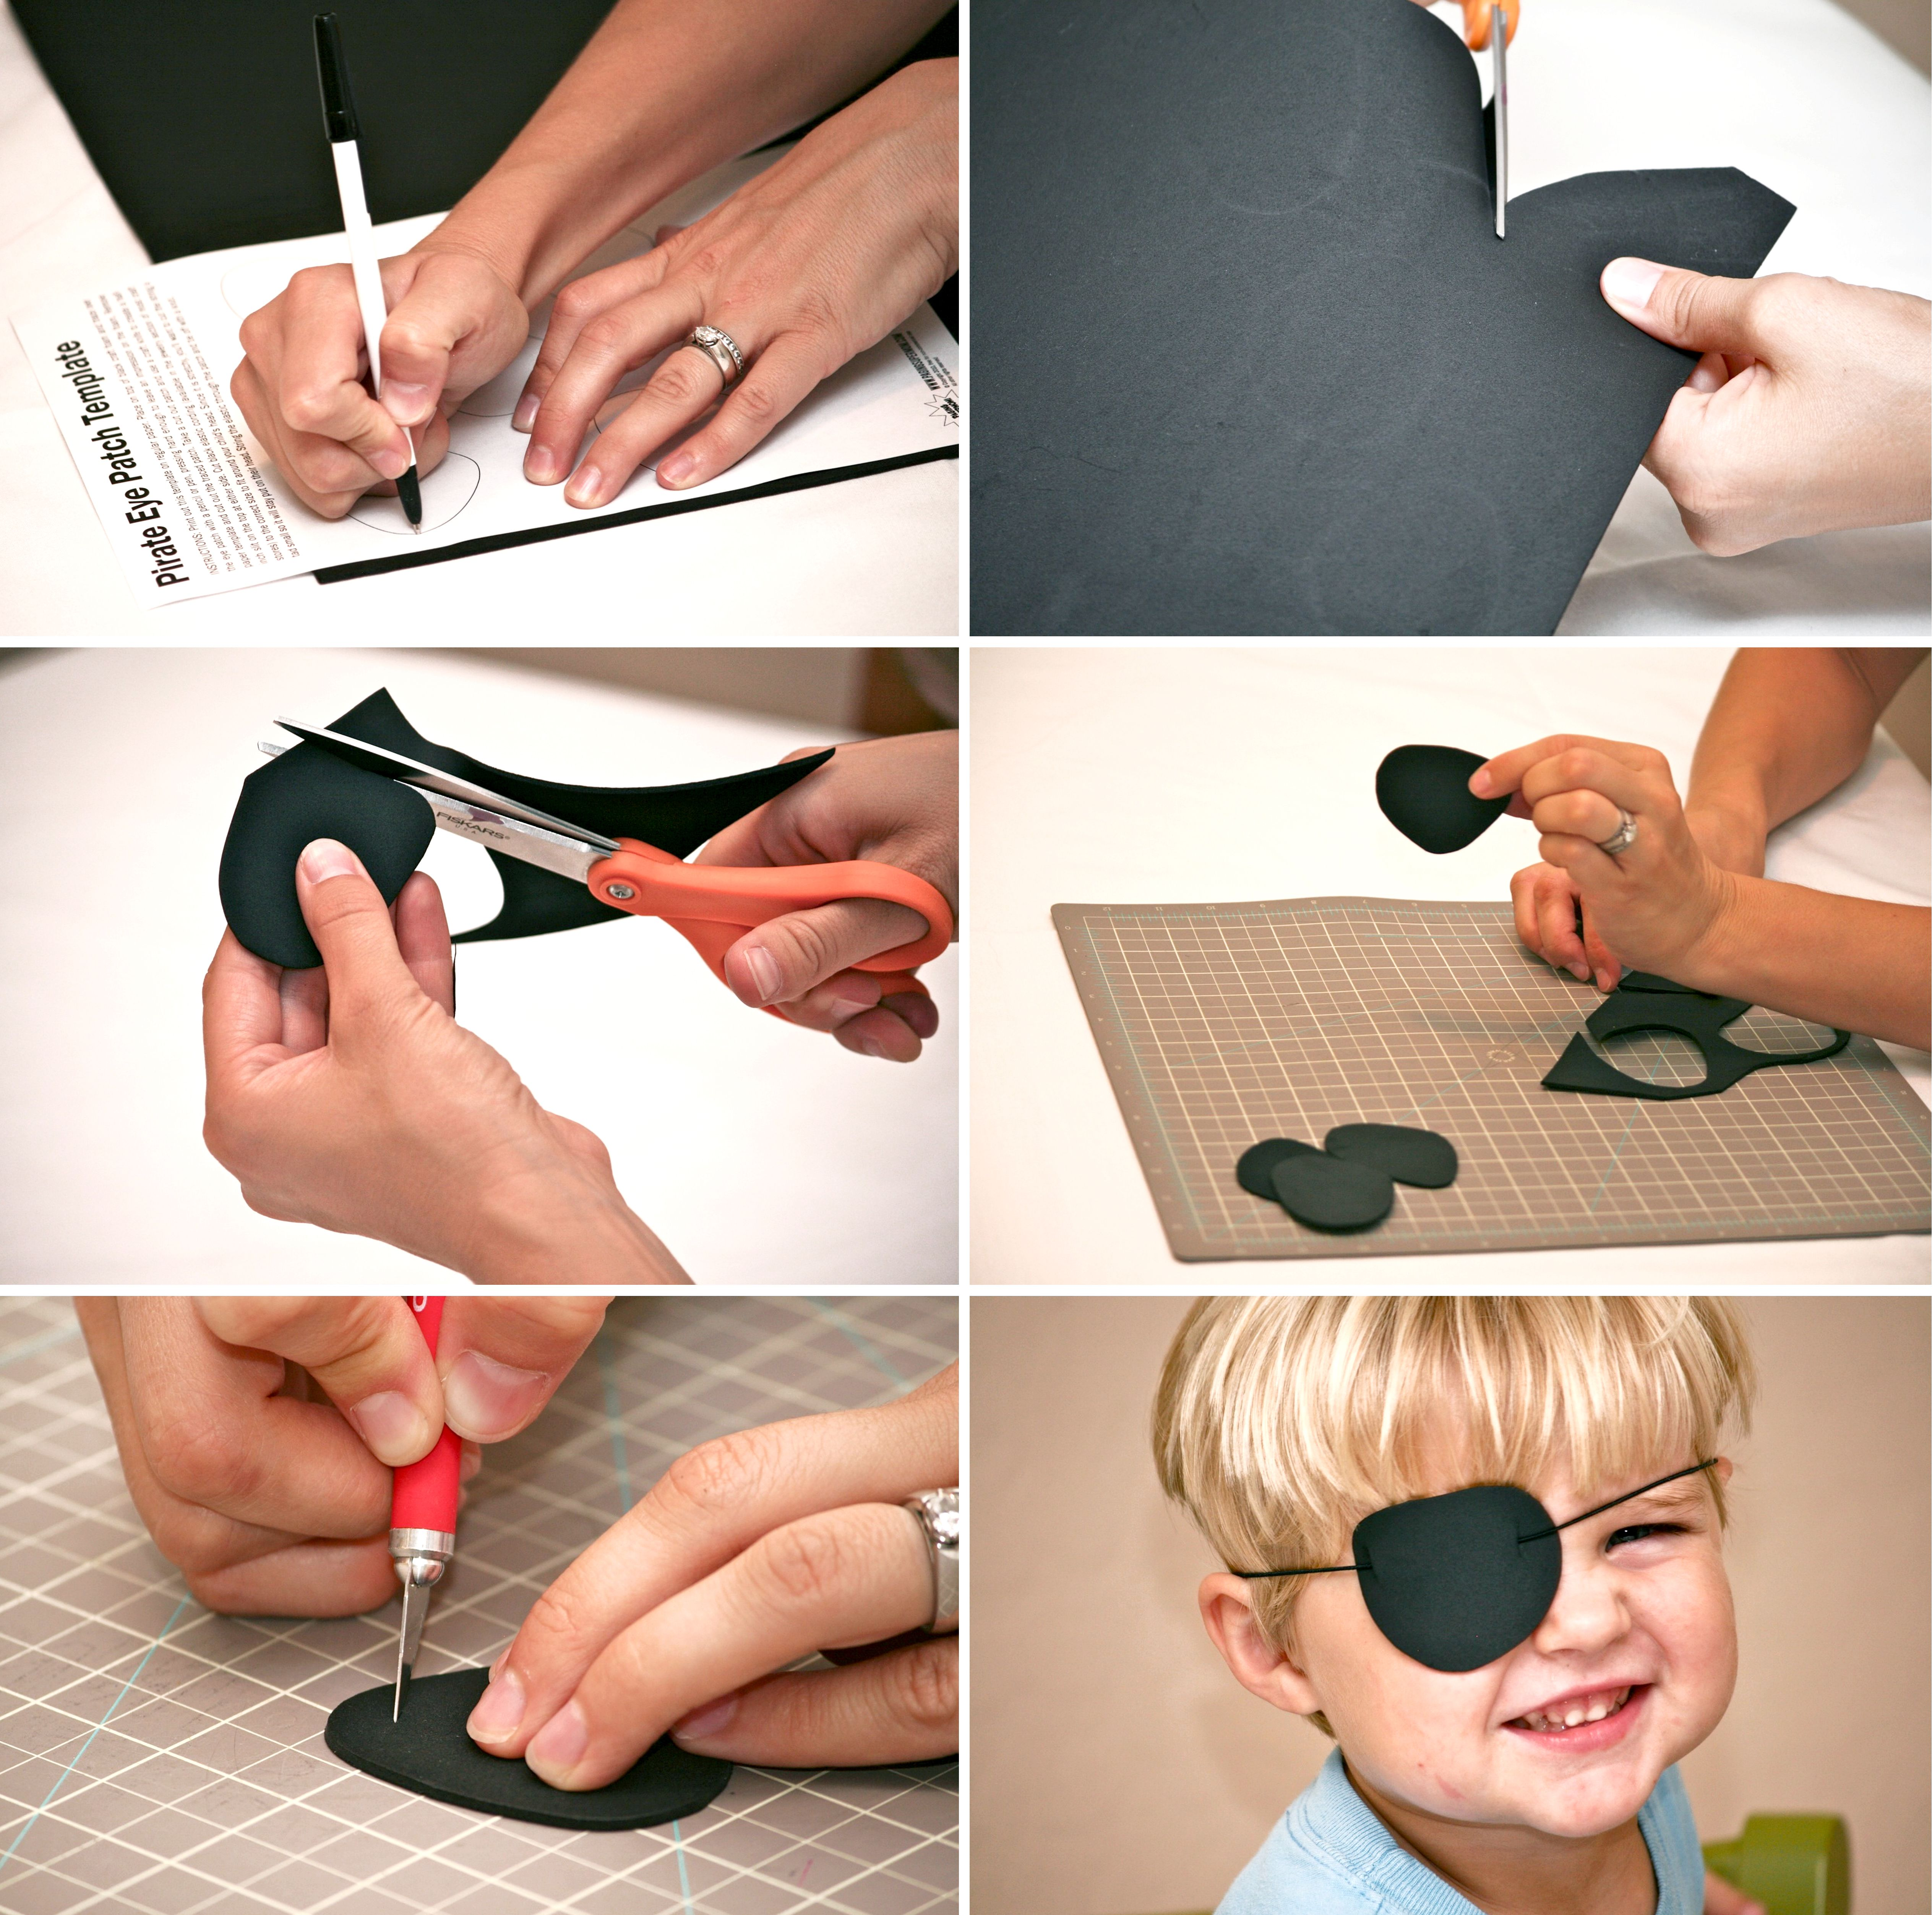 Pirate Party Ideas - Free Decor, Food and Fun Pirate Craft Ideas Kids will Love #diypiratecostumeforkids